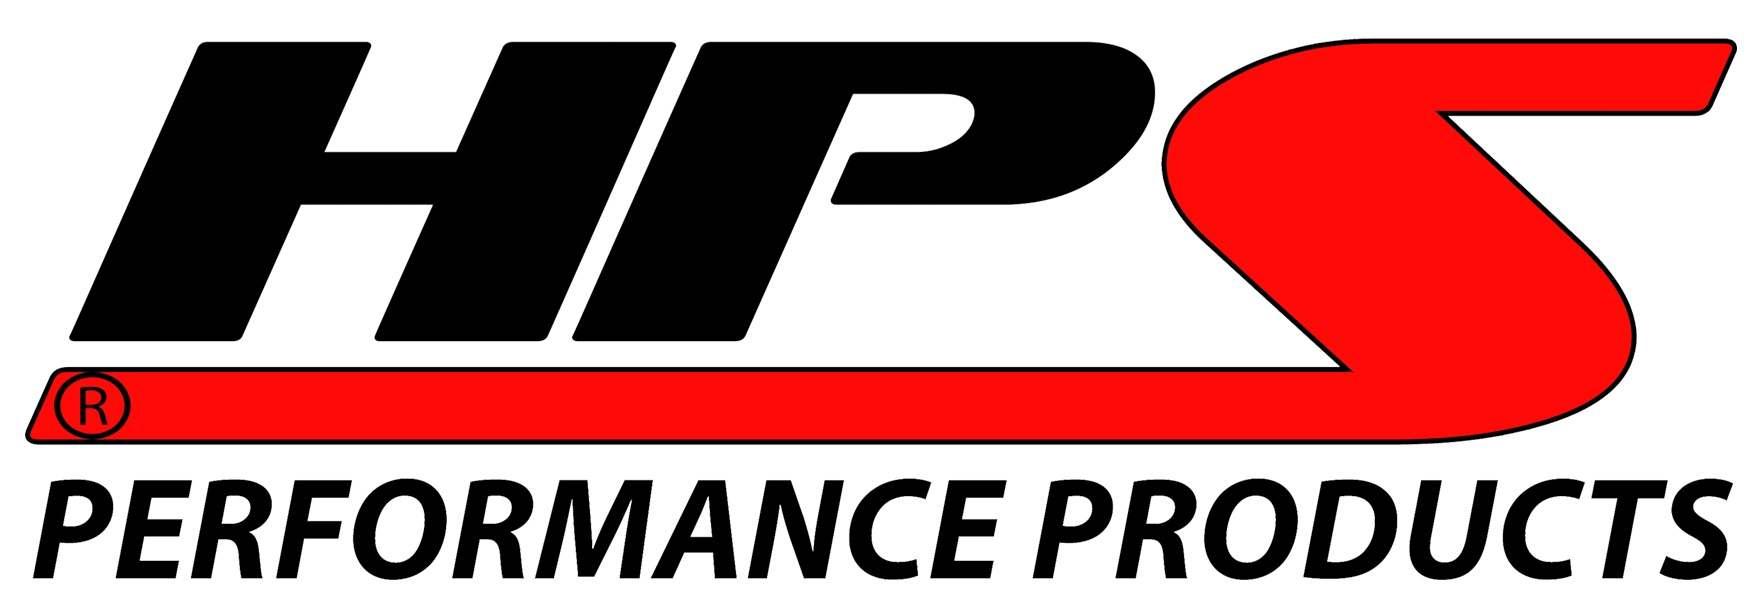 HPS PERFORMANCE - Radiator Coolant Hose Kit - H9S 57-1607-BLK